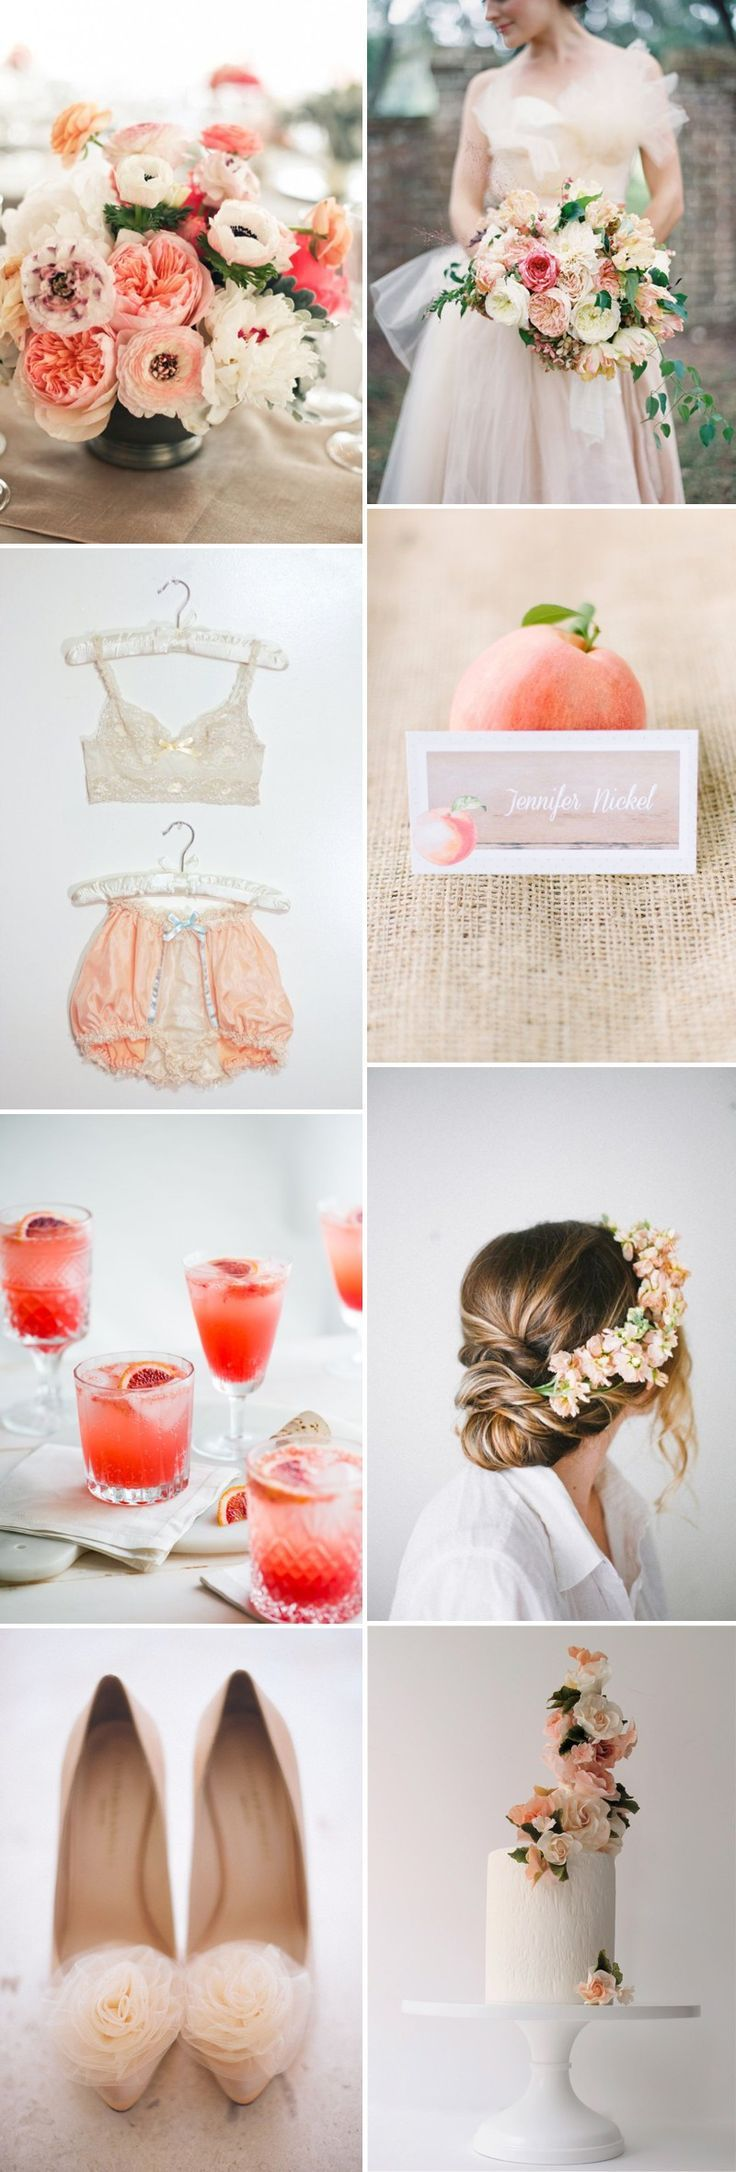 98 best Wedding Mood Board Magic images on Pinterest | Wedding ideas ...